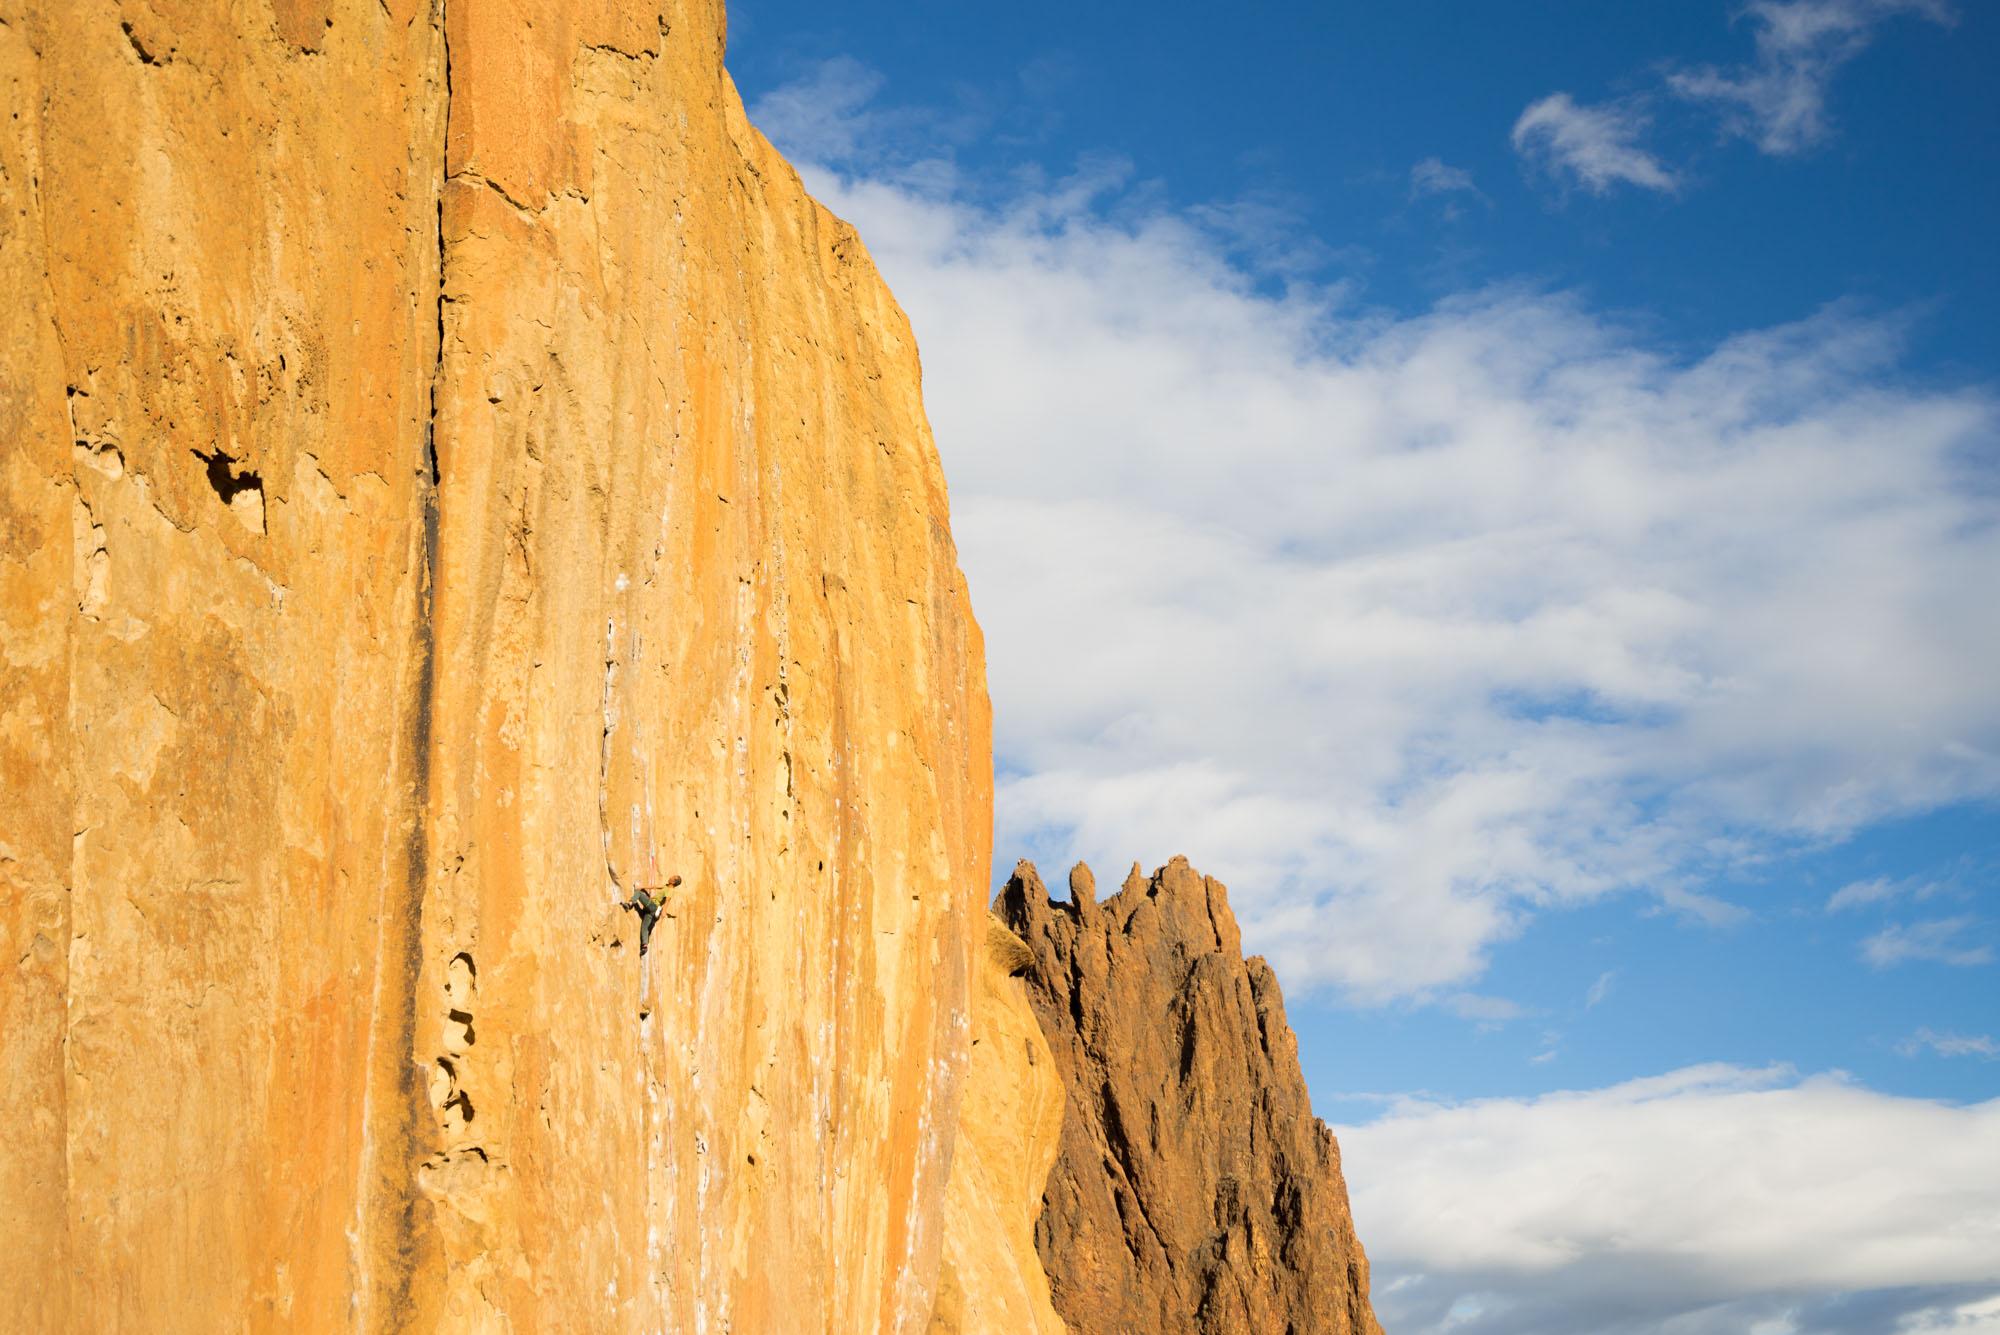 Climbing Morning Glory Wall